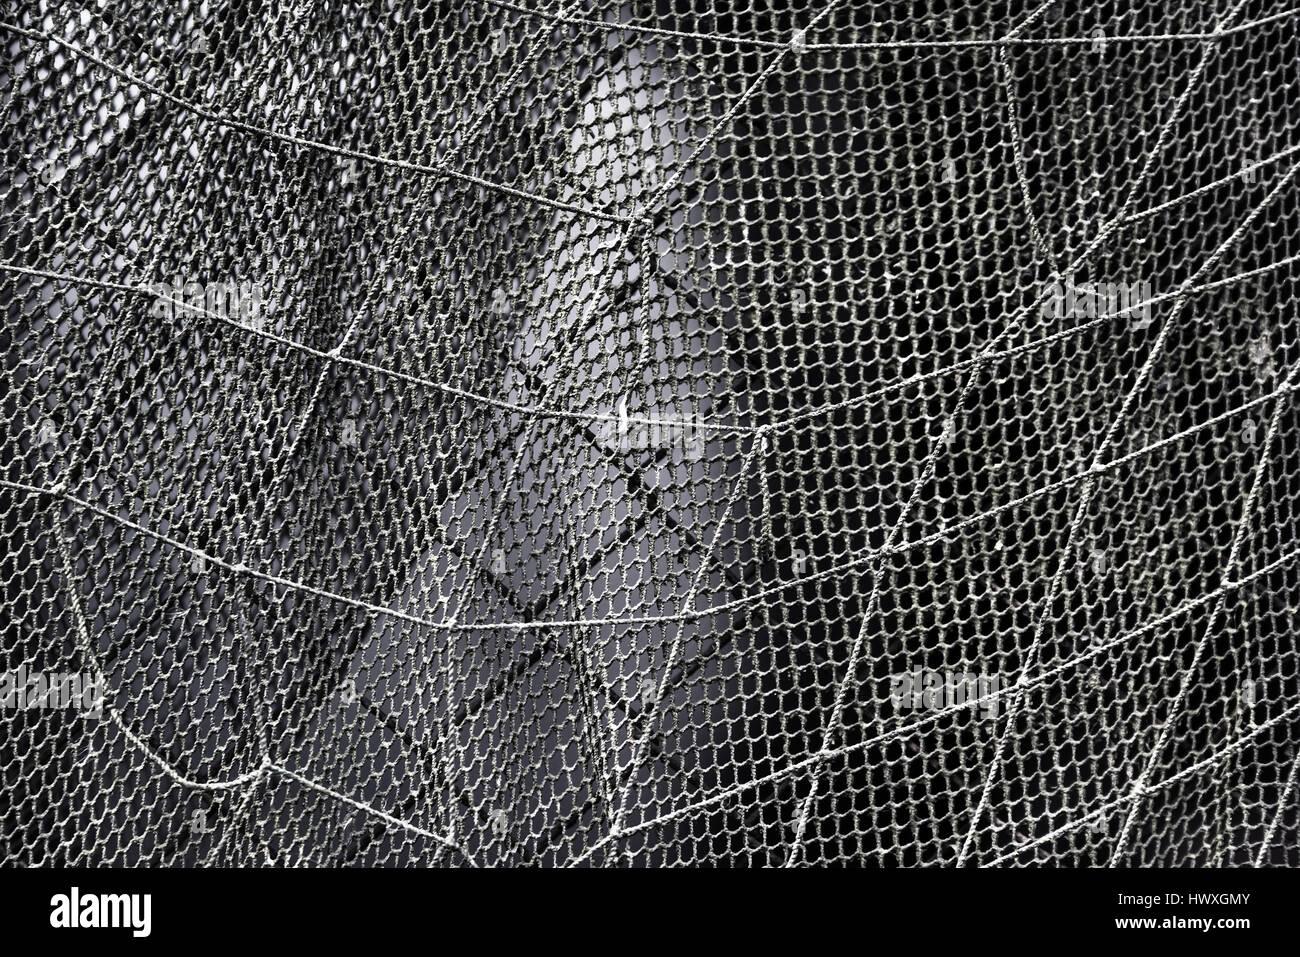 Fishing net texture - Stock Image